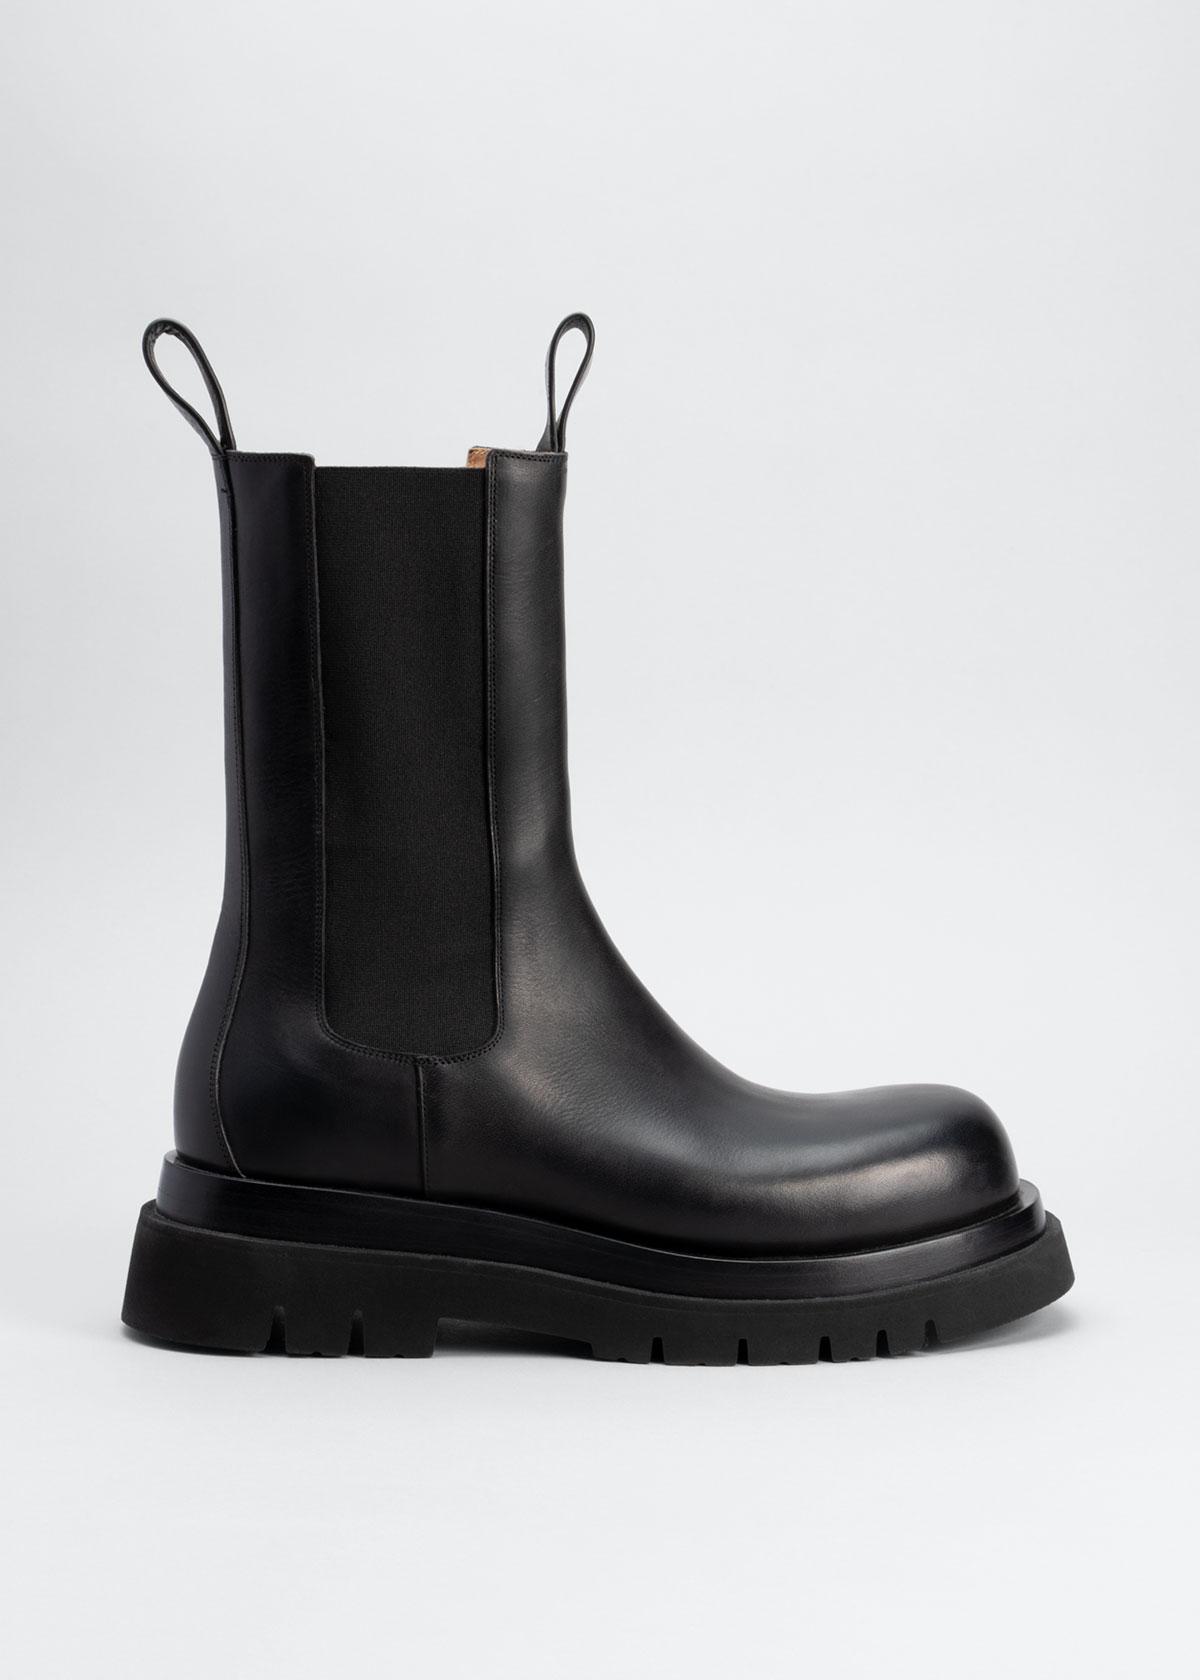 Flat Chelsea Combat Boots by Bottega Veneta, available on modesens.com for $990 Mila Kunis Shoes Exact Product